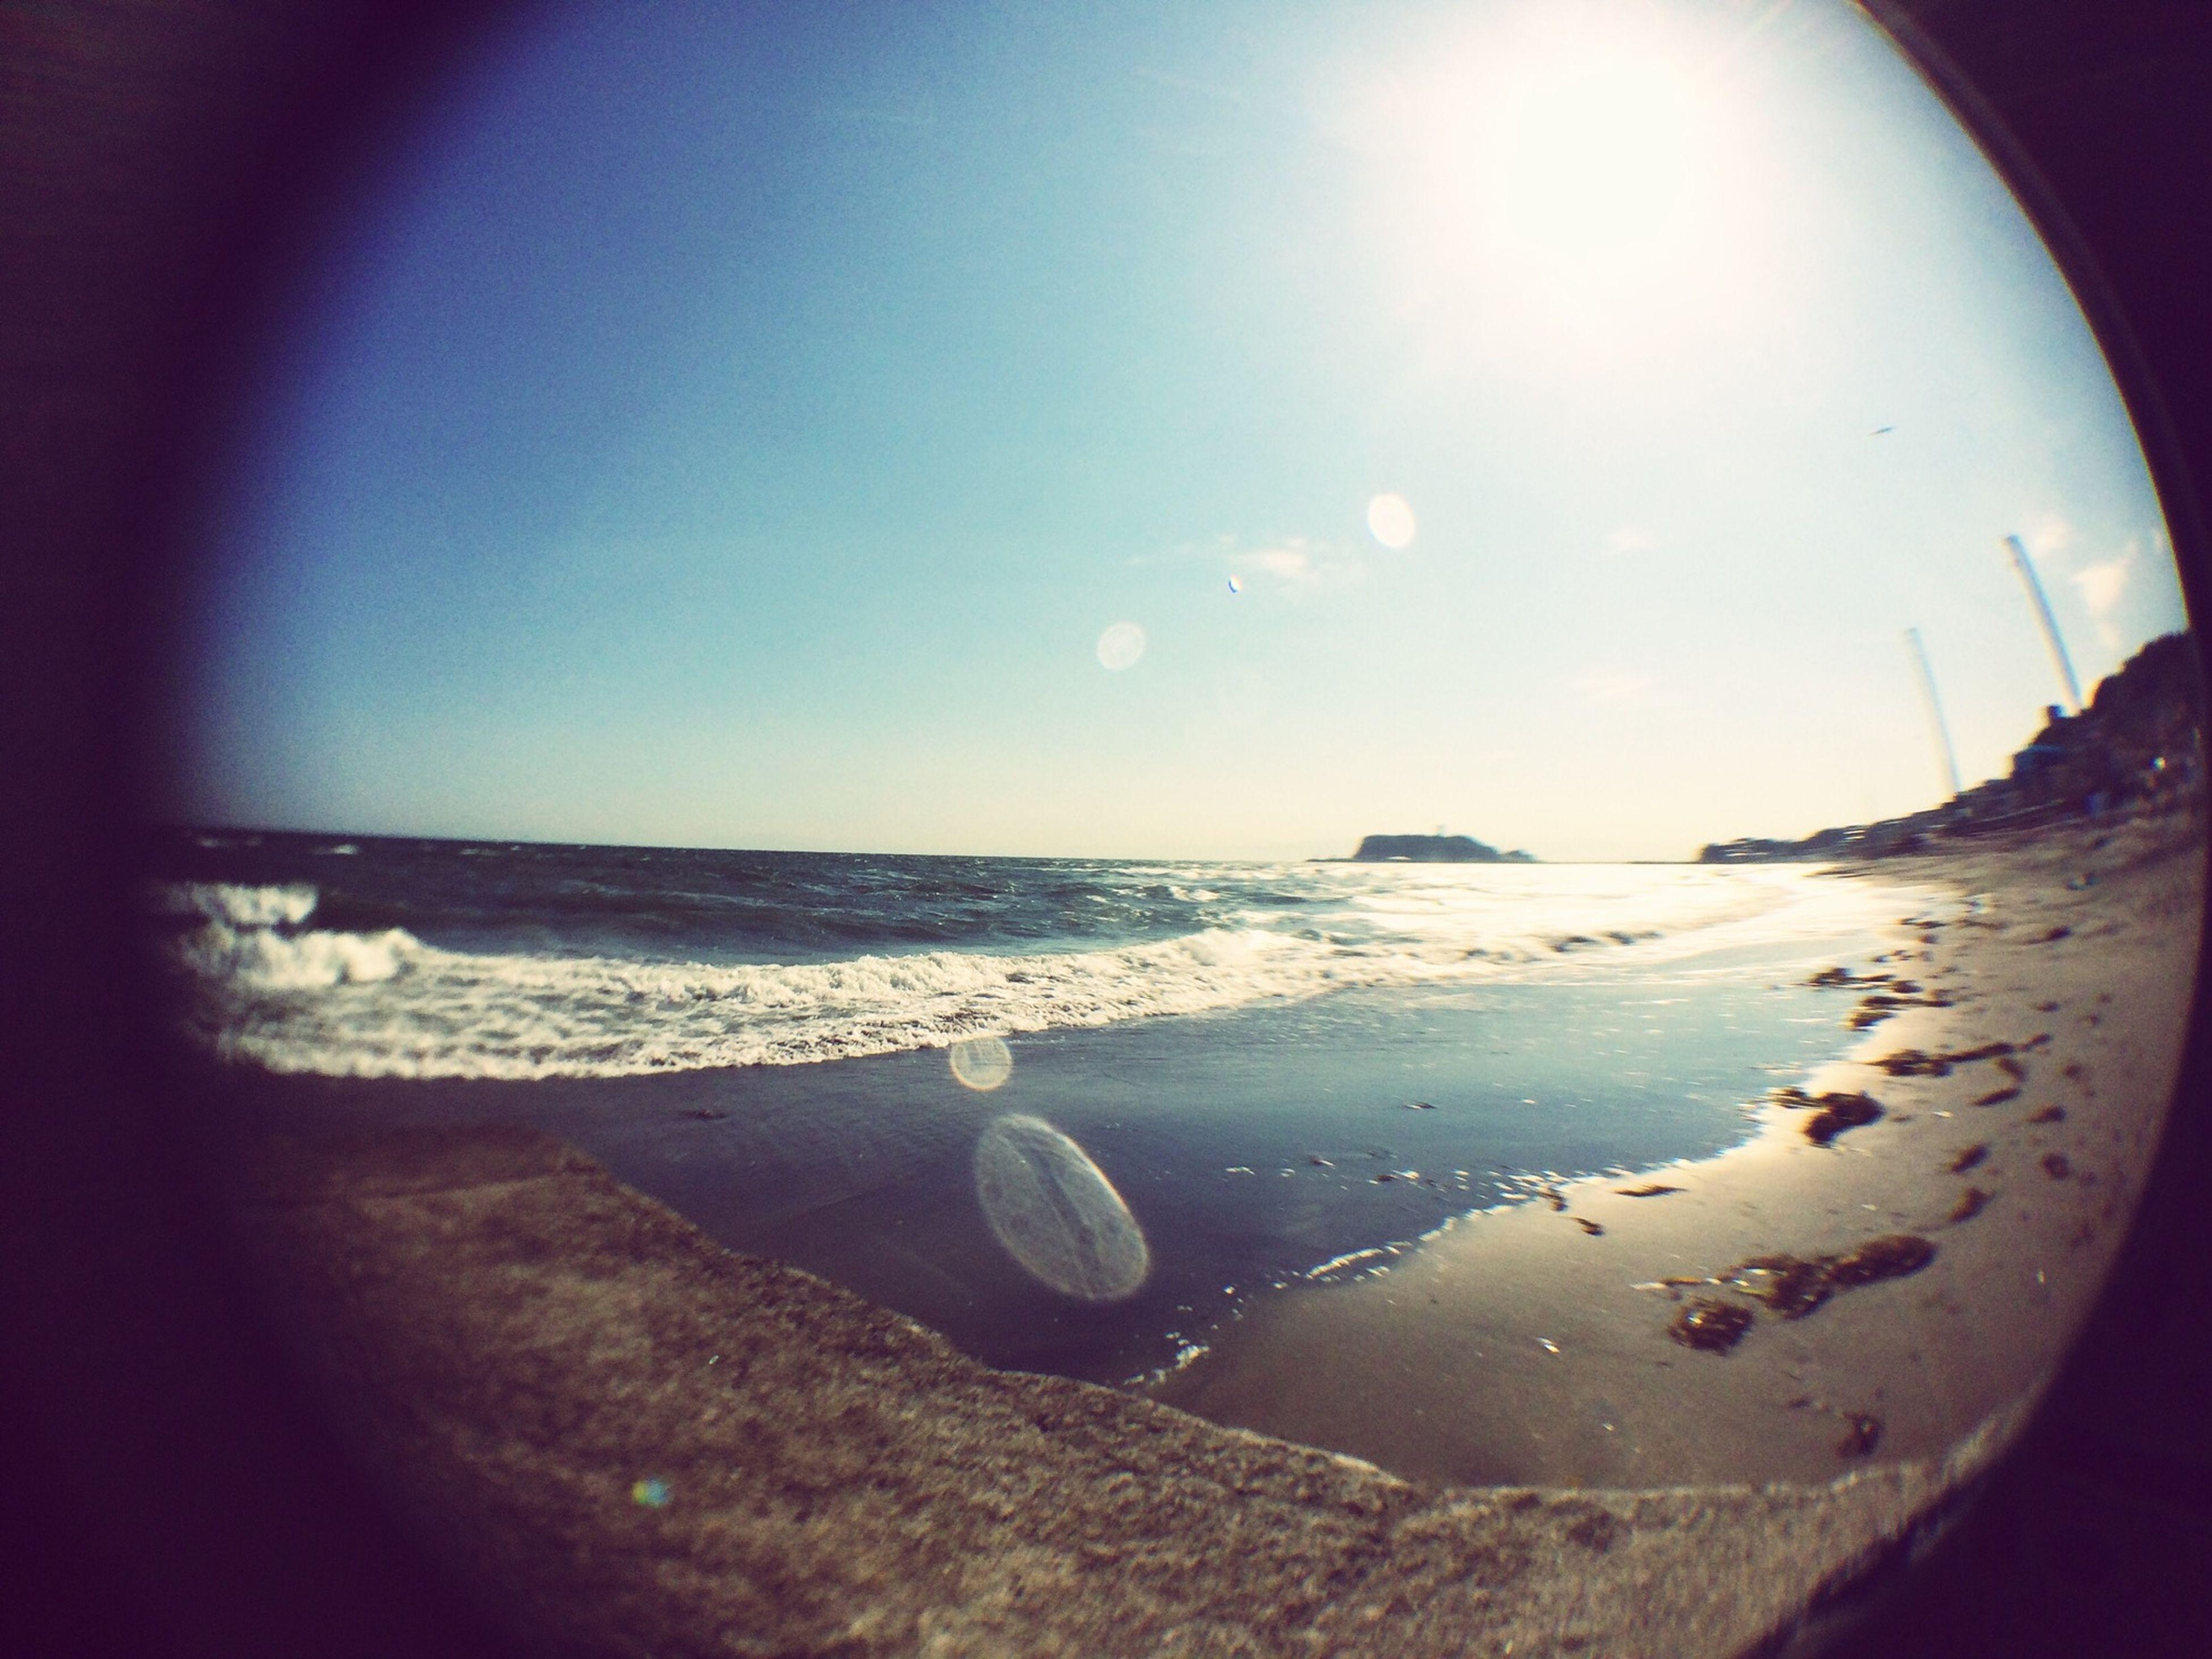 sea, beach, horizon over water, water, shore, sand, scenics, tranquility, tranquil scene, sky, beauty in nature, nature, coastline, sunlight, sun, wave, idyllic, fish-eye lens, surf, vacations